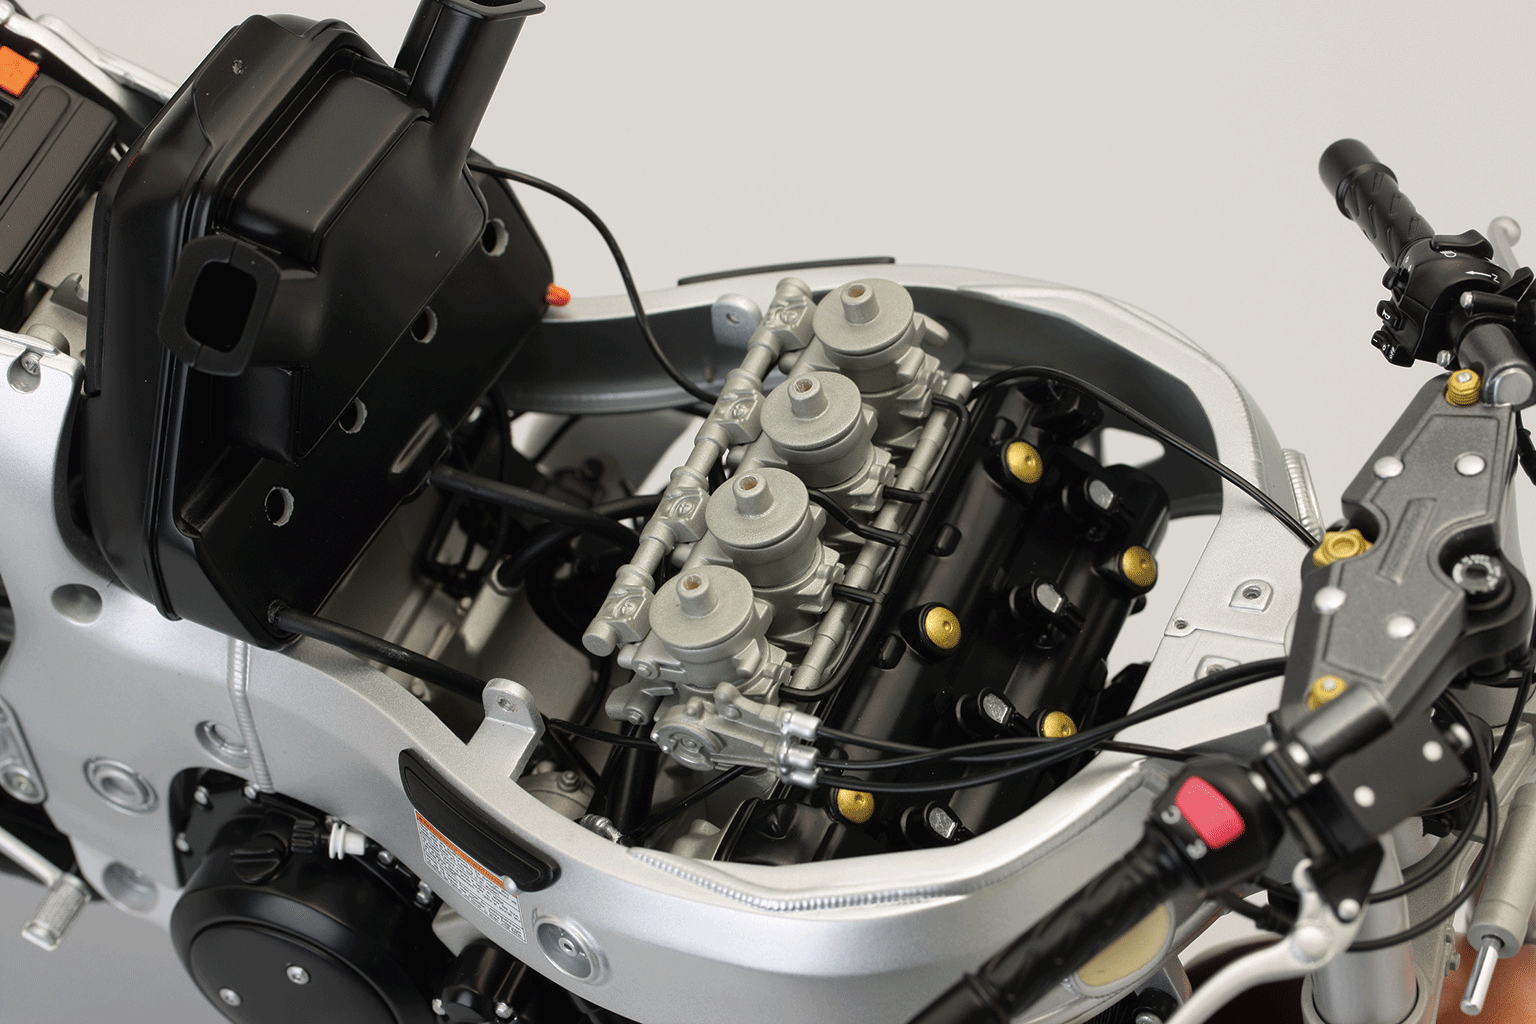 Suzuki Gsx 1300r Hayabusa Model Motorcycle Modelspace